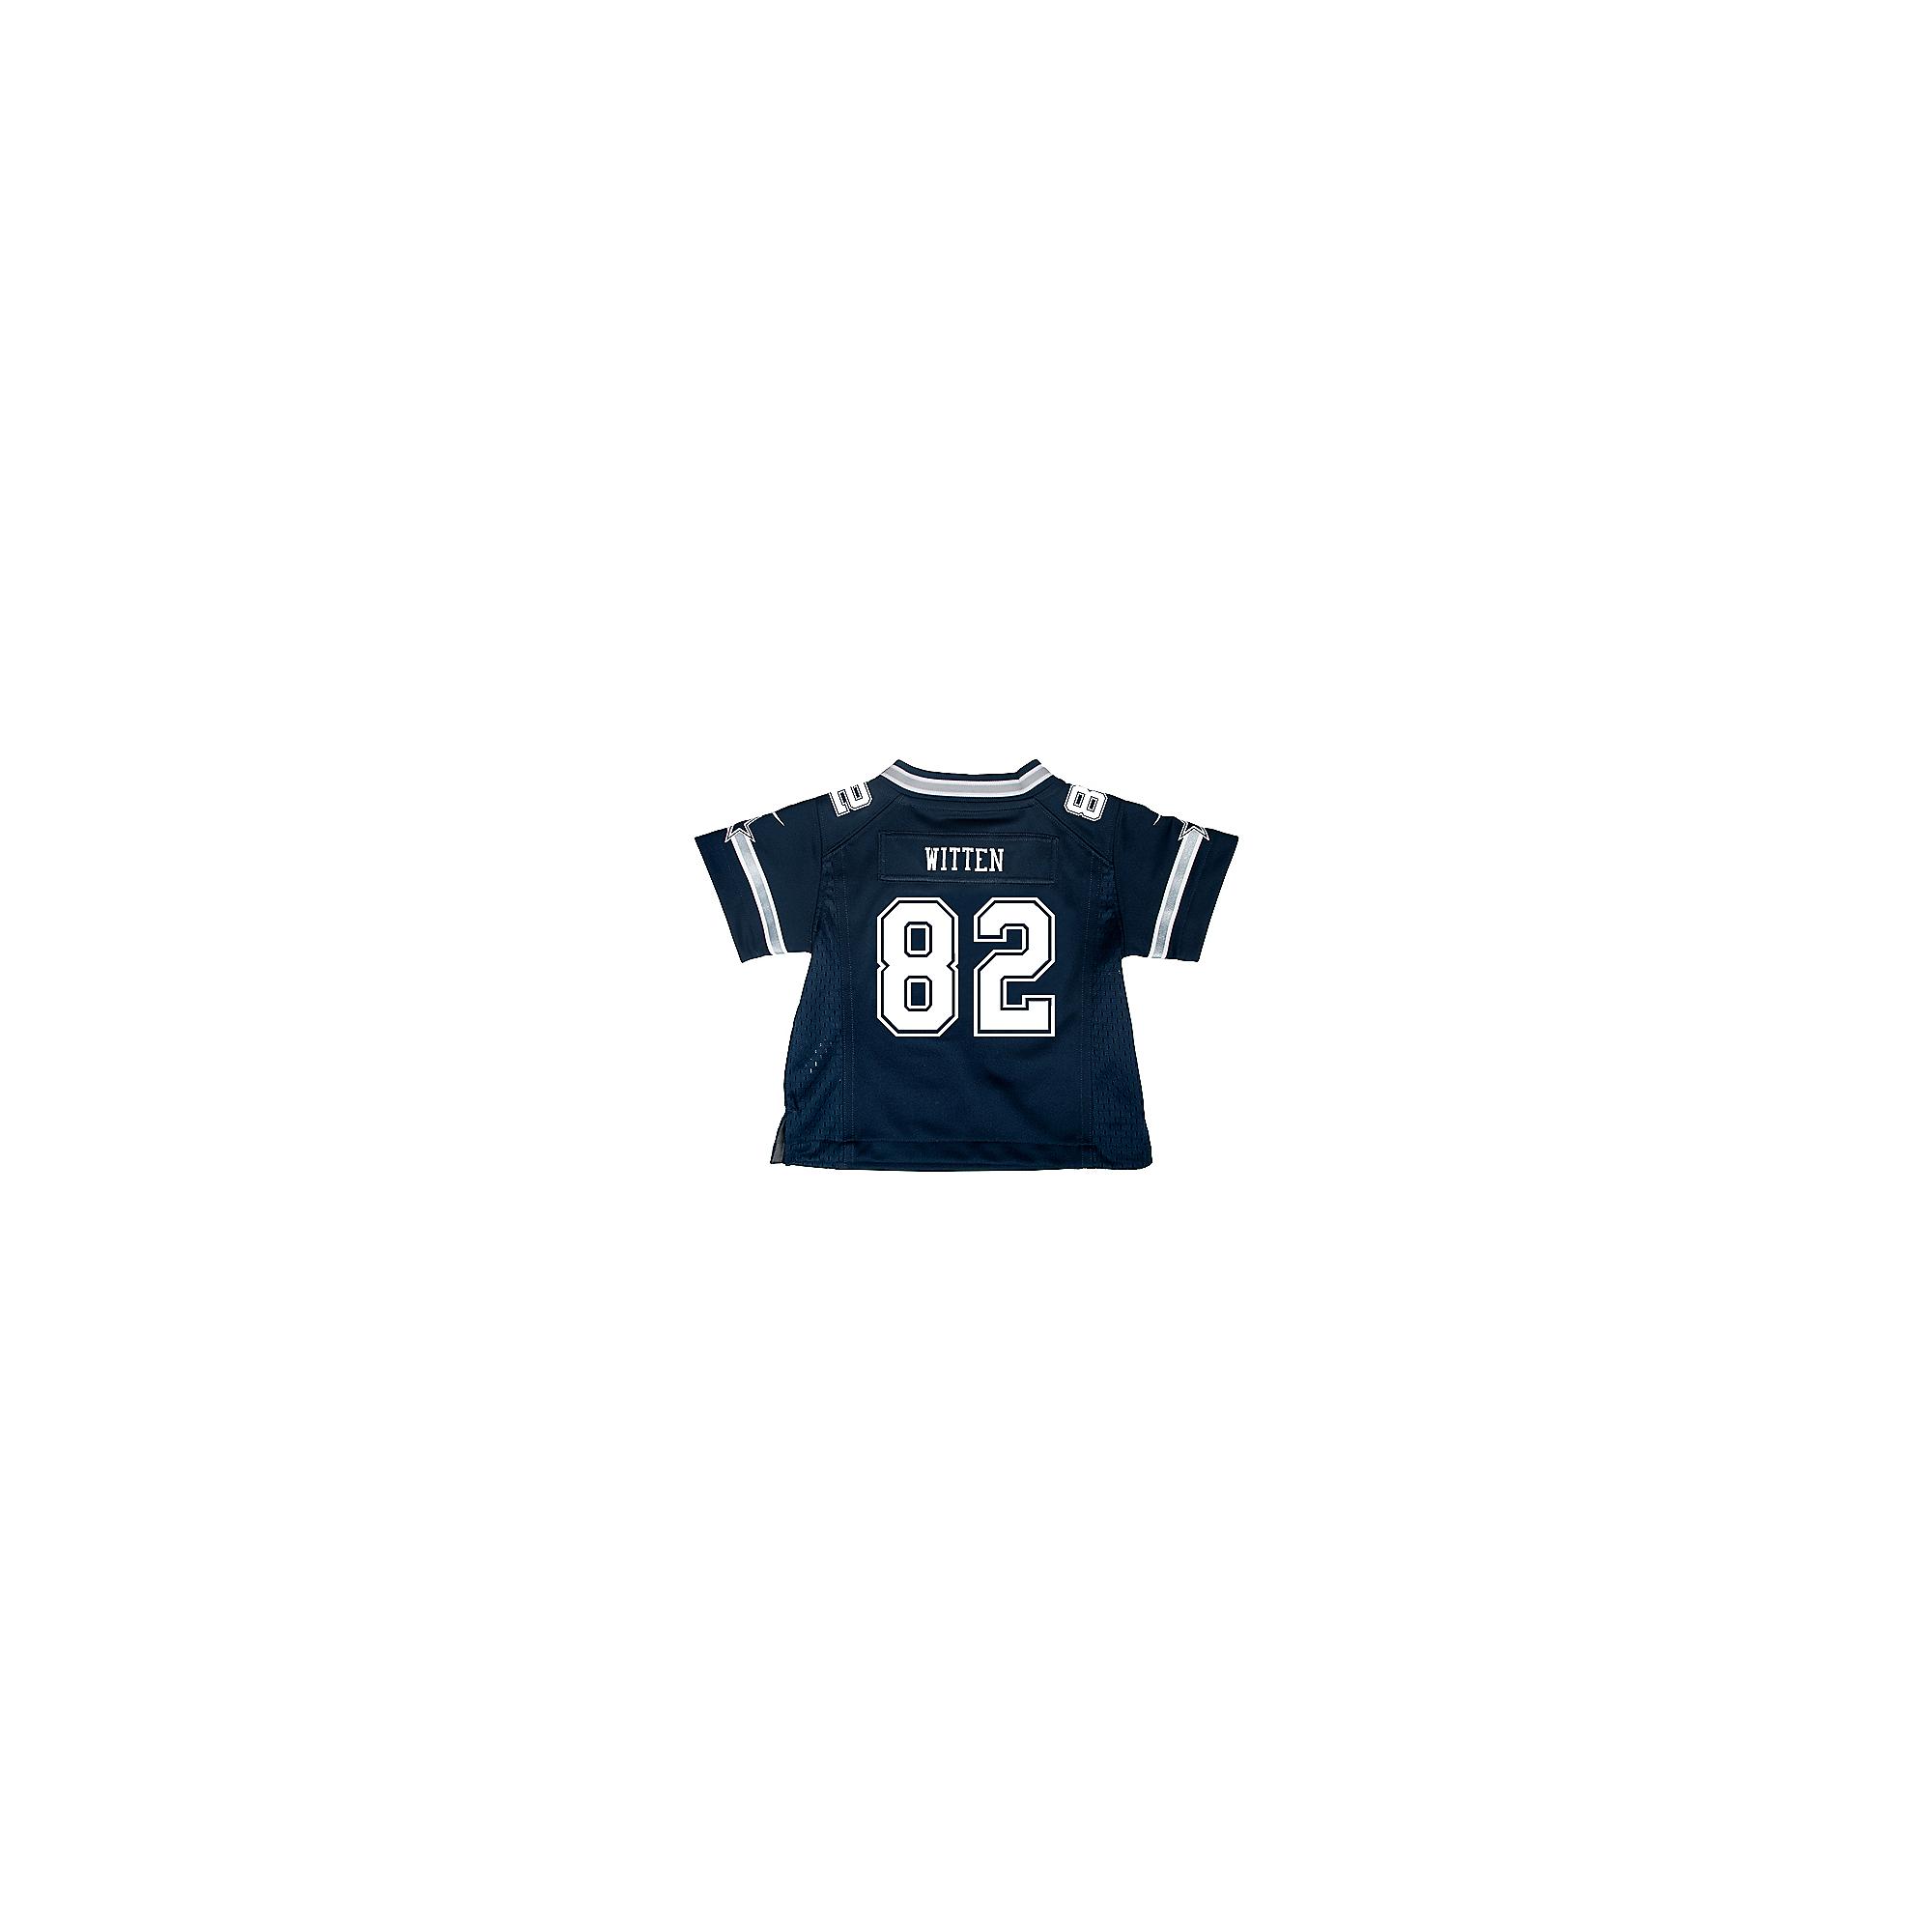 744135a8306 Dallas Cowboys Infant Jason Witten #82 Nike Game Replica Jersey ...